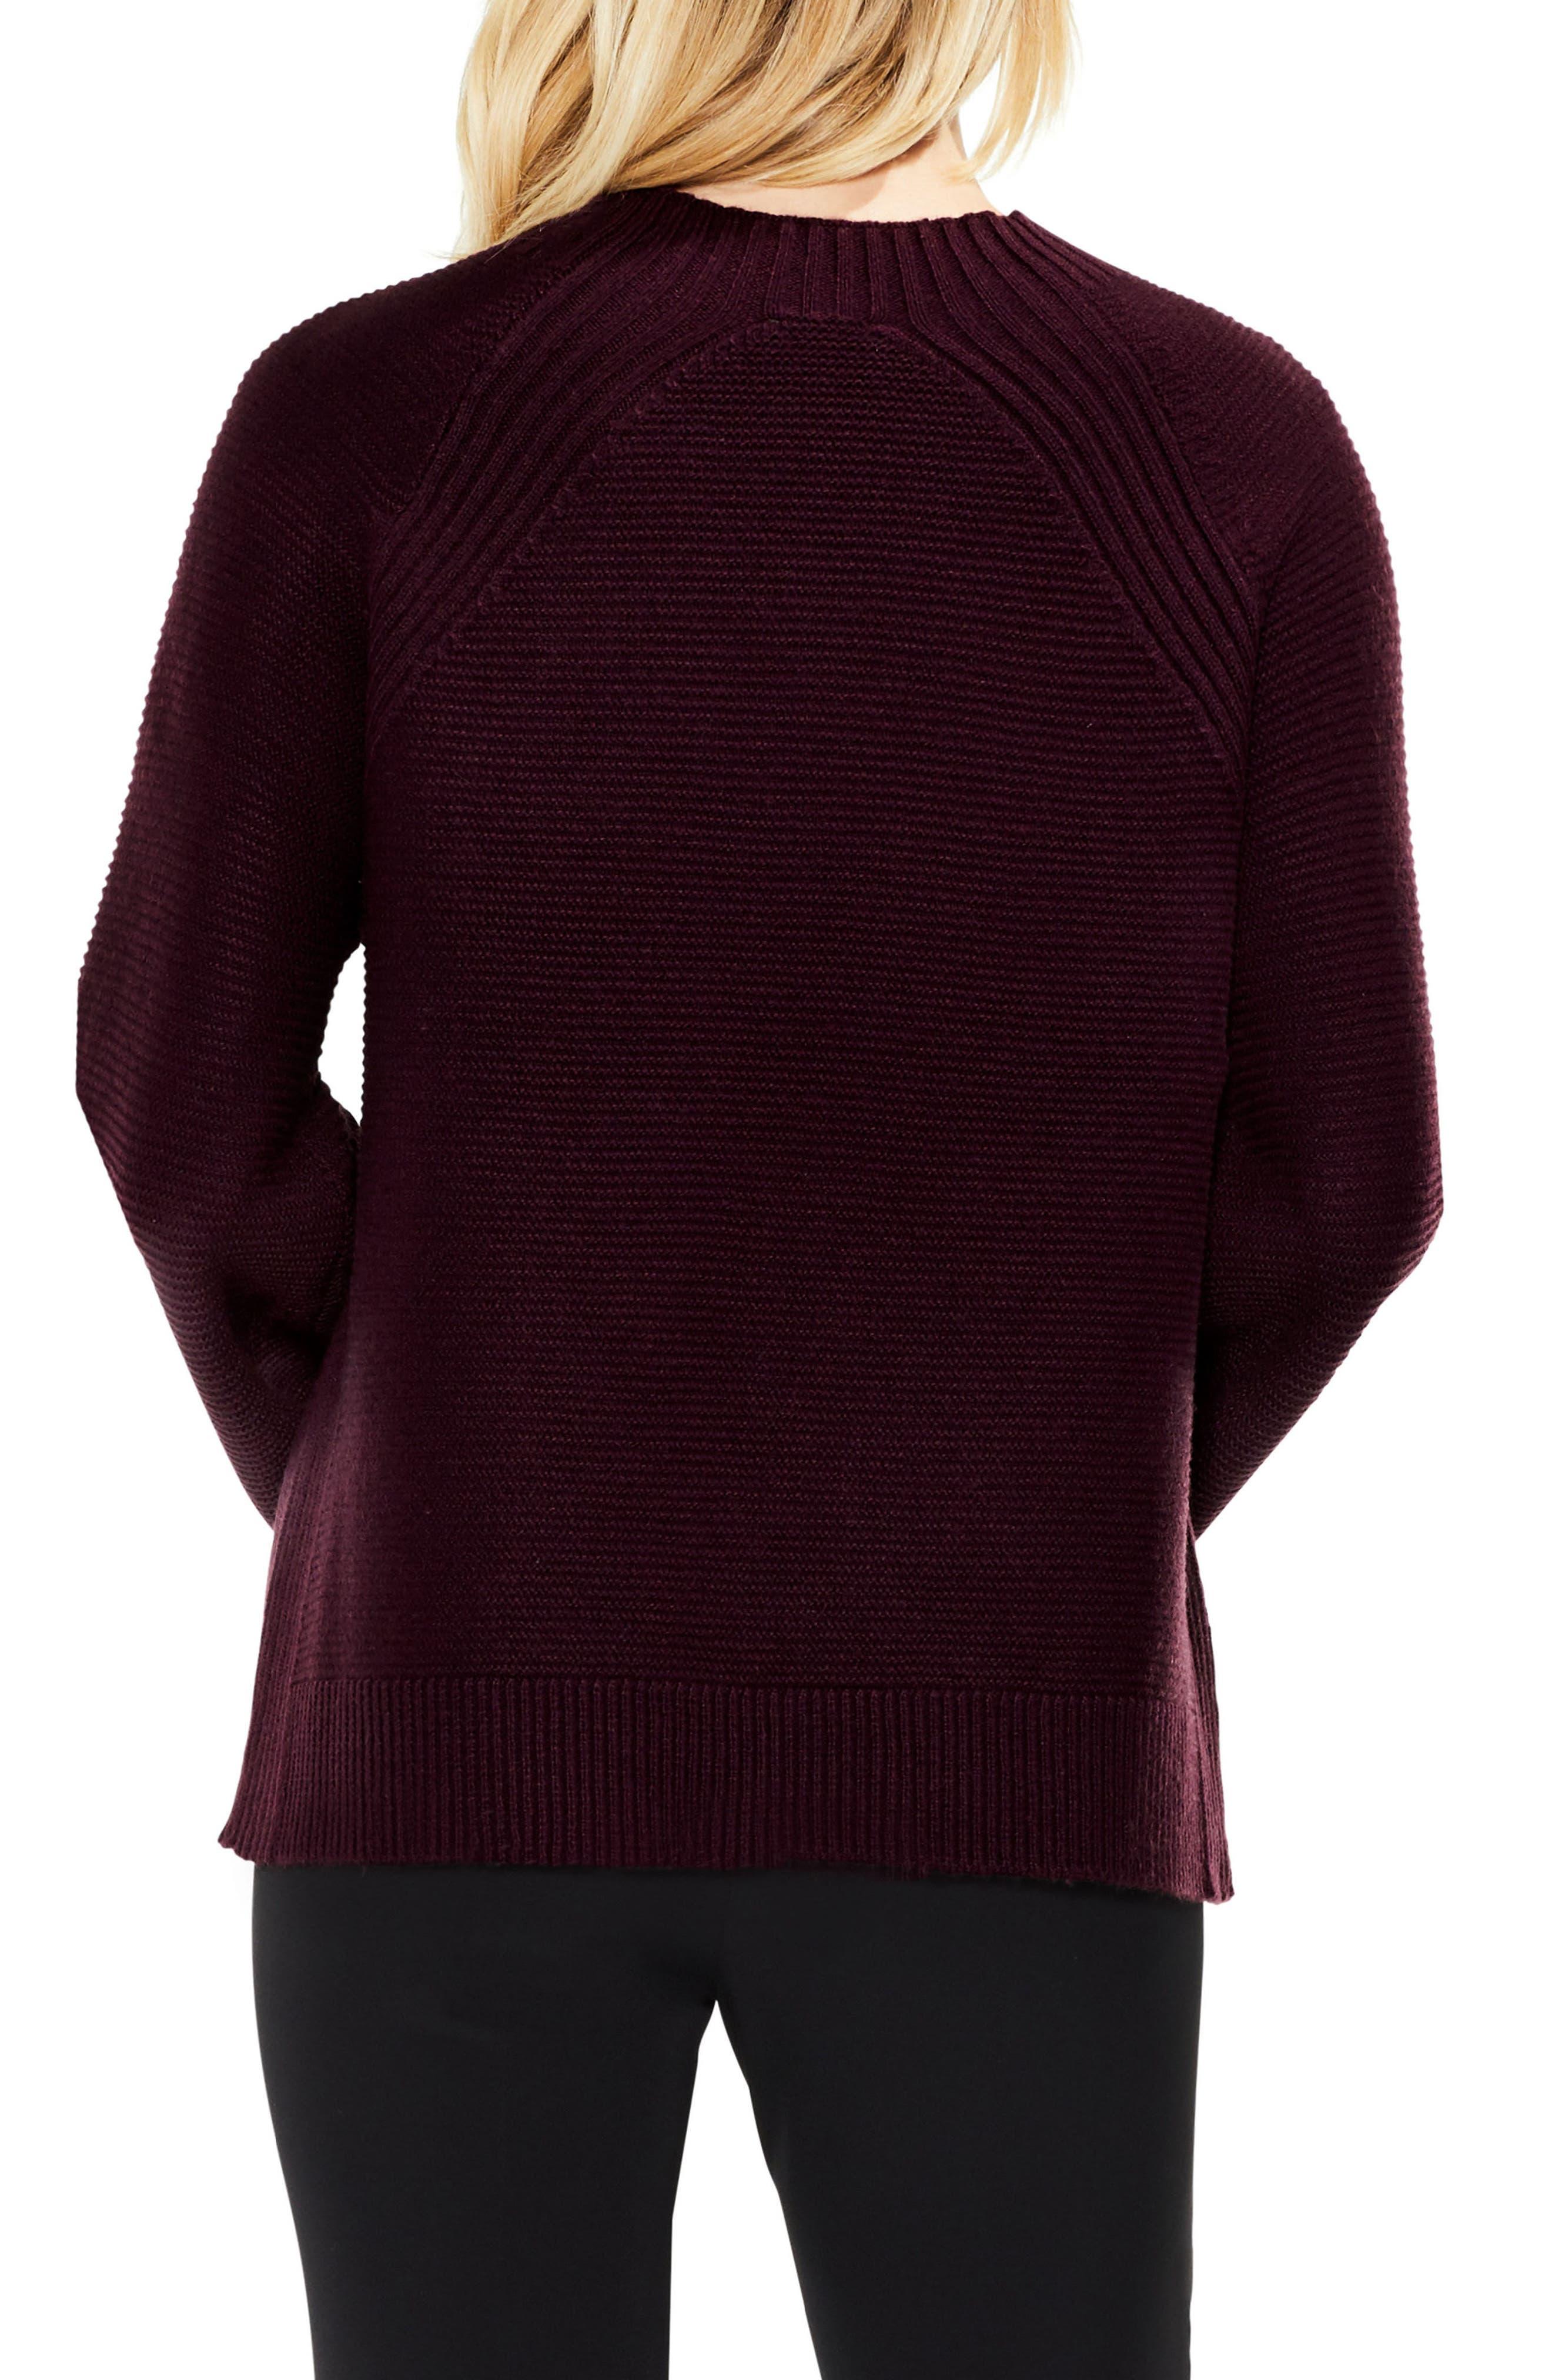 Bell Sleeve Sweater,                             Alternate thumbnail 2, color,                             Cherry Noir